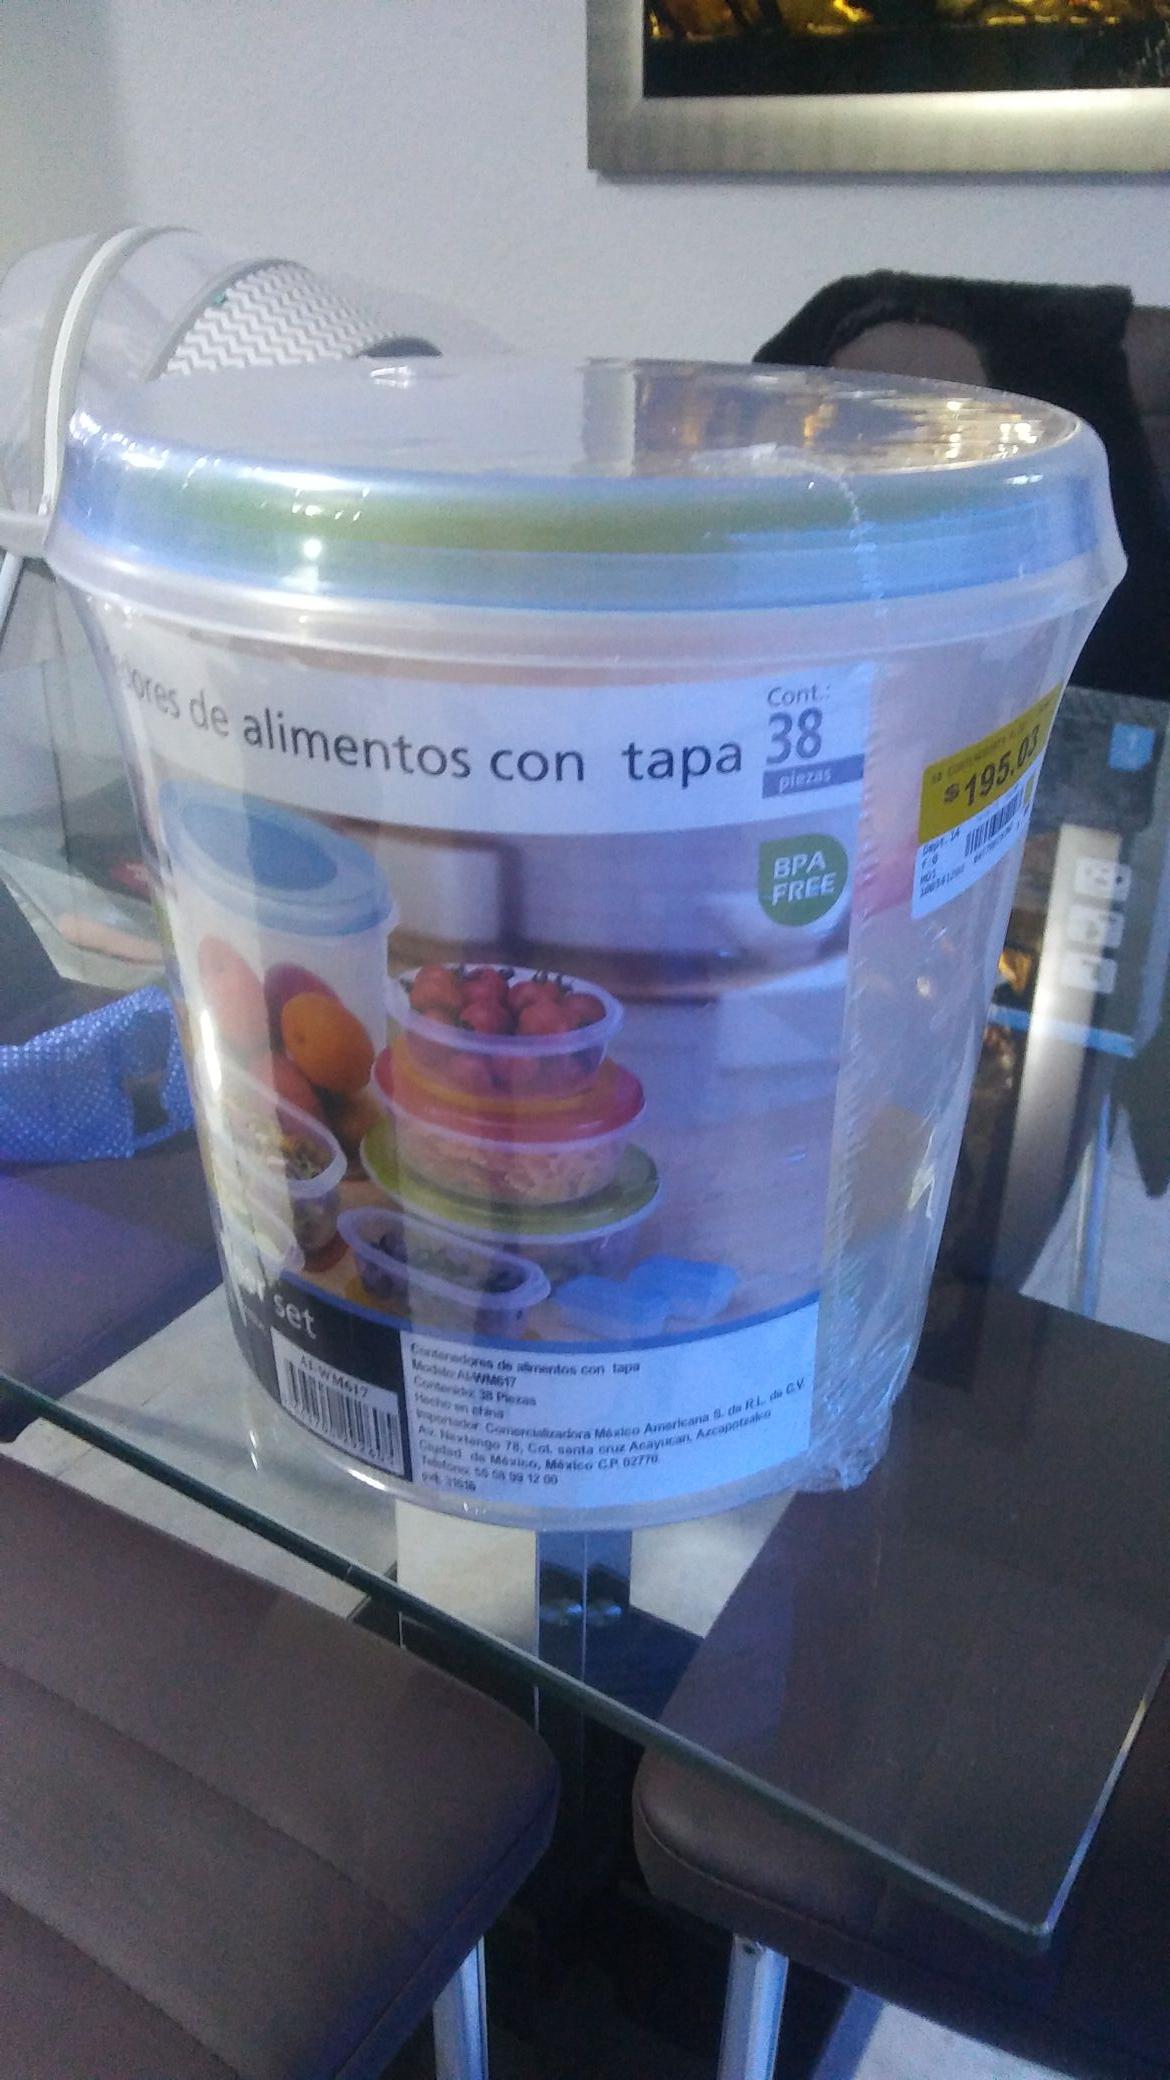 Bodega Aurrera: Contenedores de alimentos con tapa - 38 Piezas